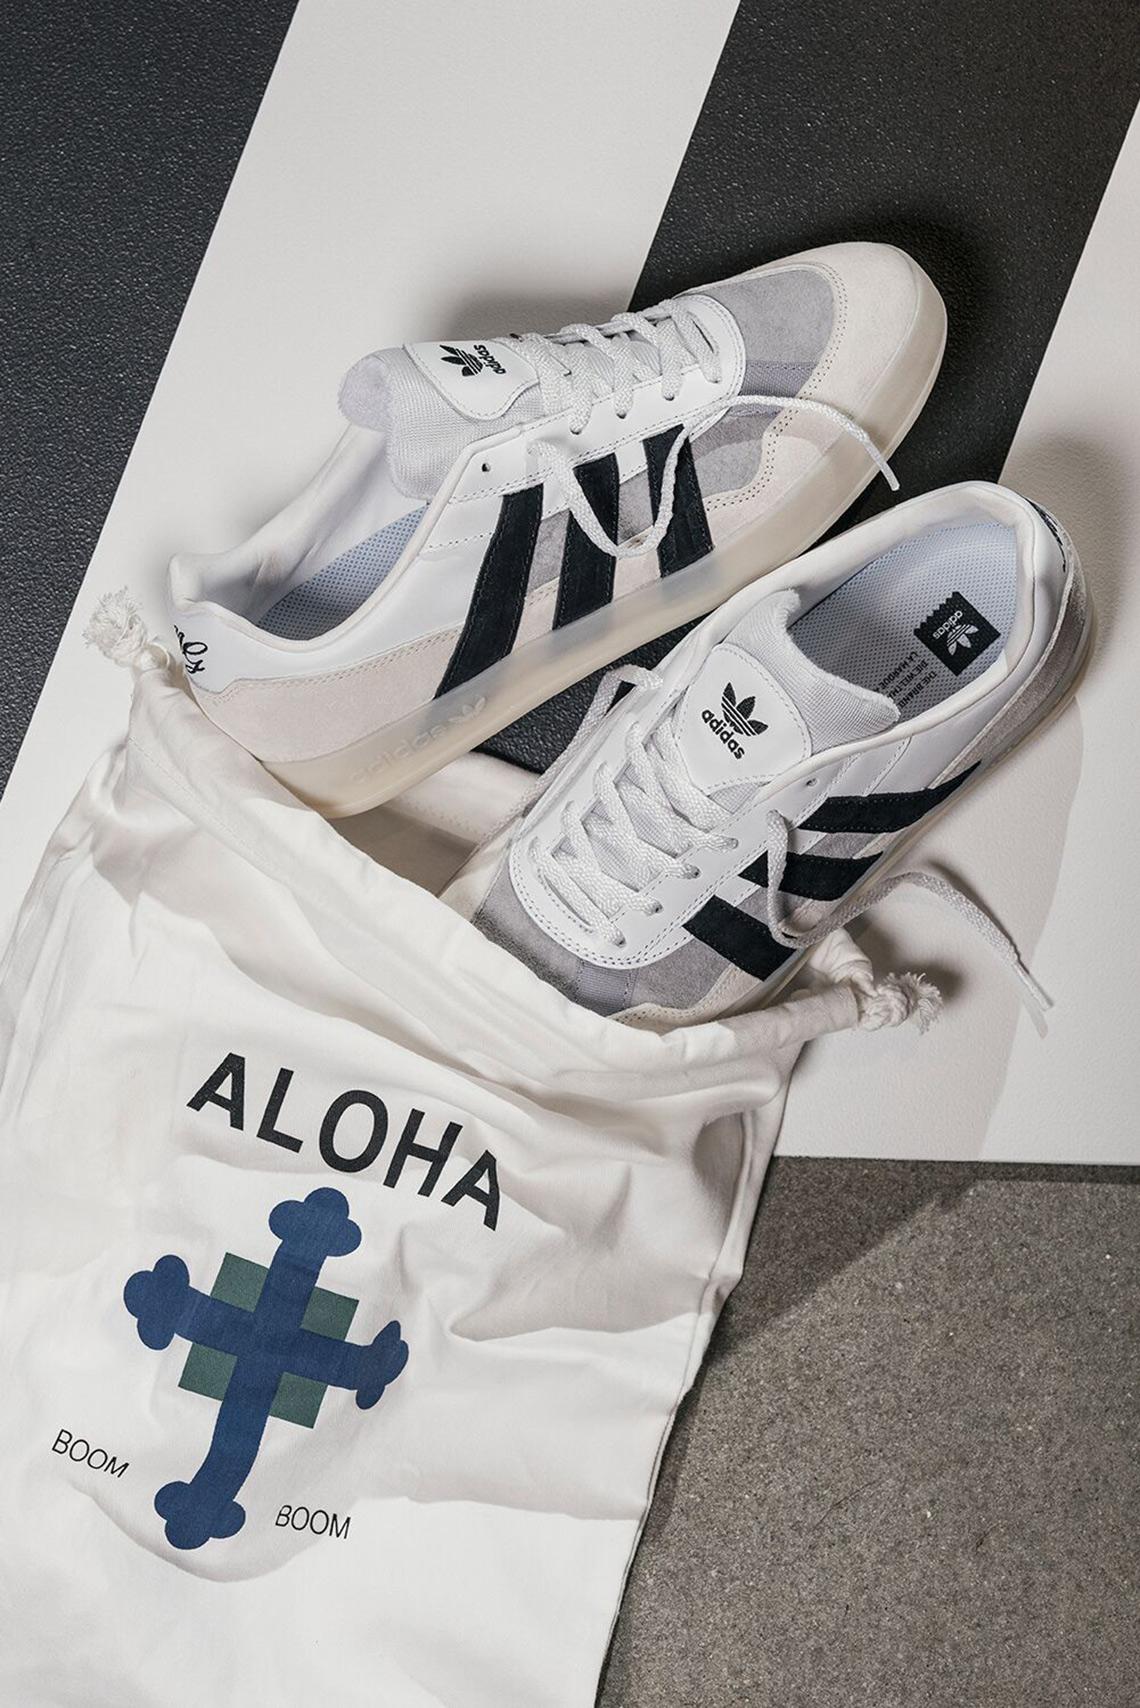 Mark Gonzales adidas SB Aloha Super Photos + Release Info ... bf469d3b410